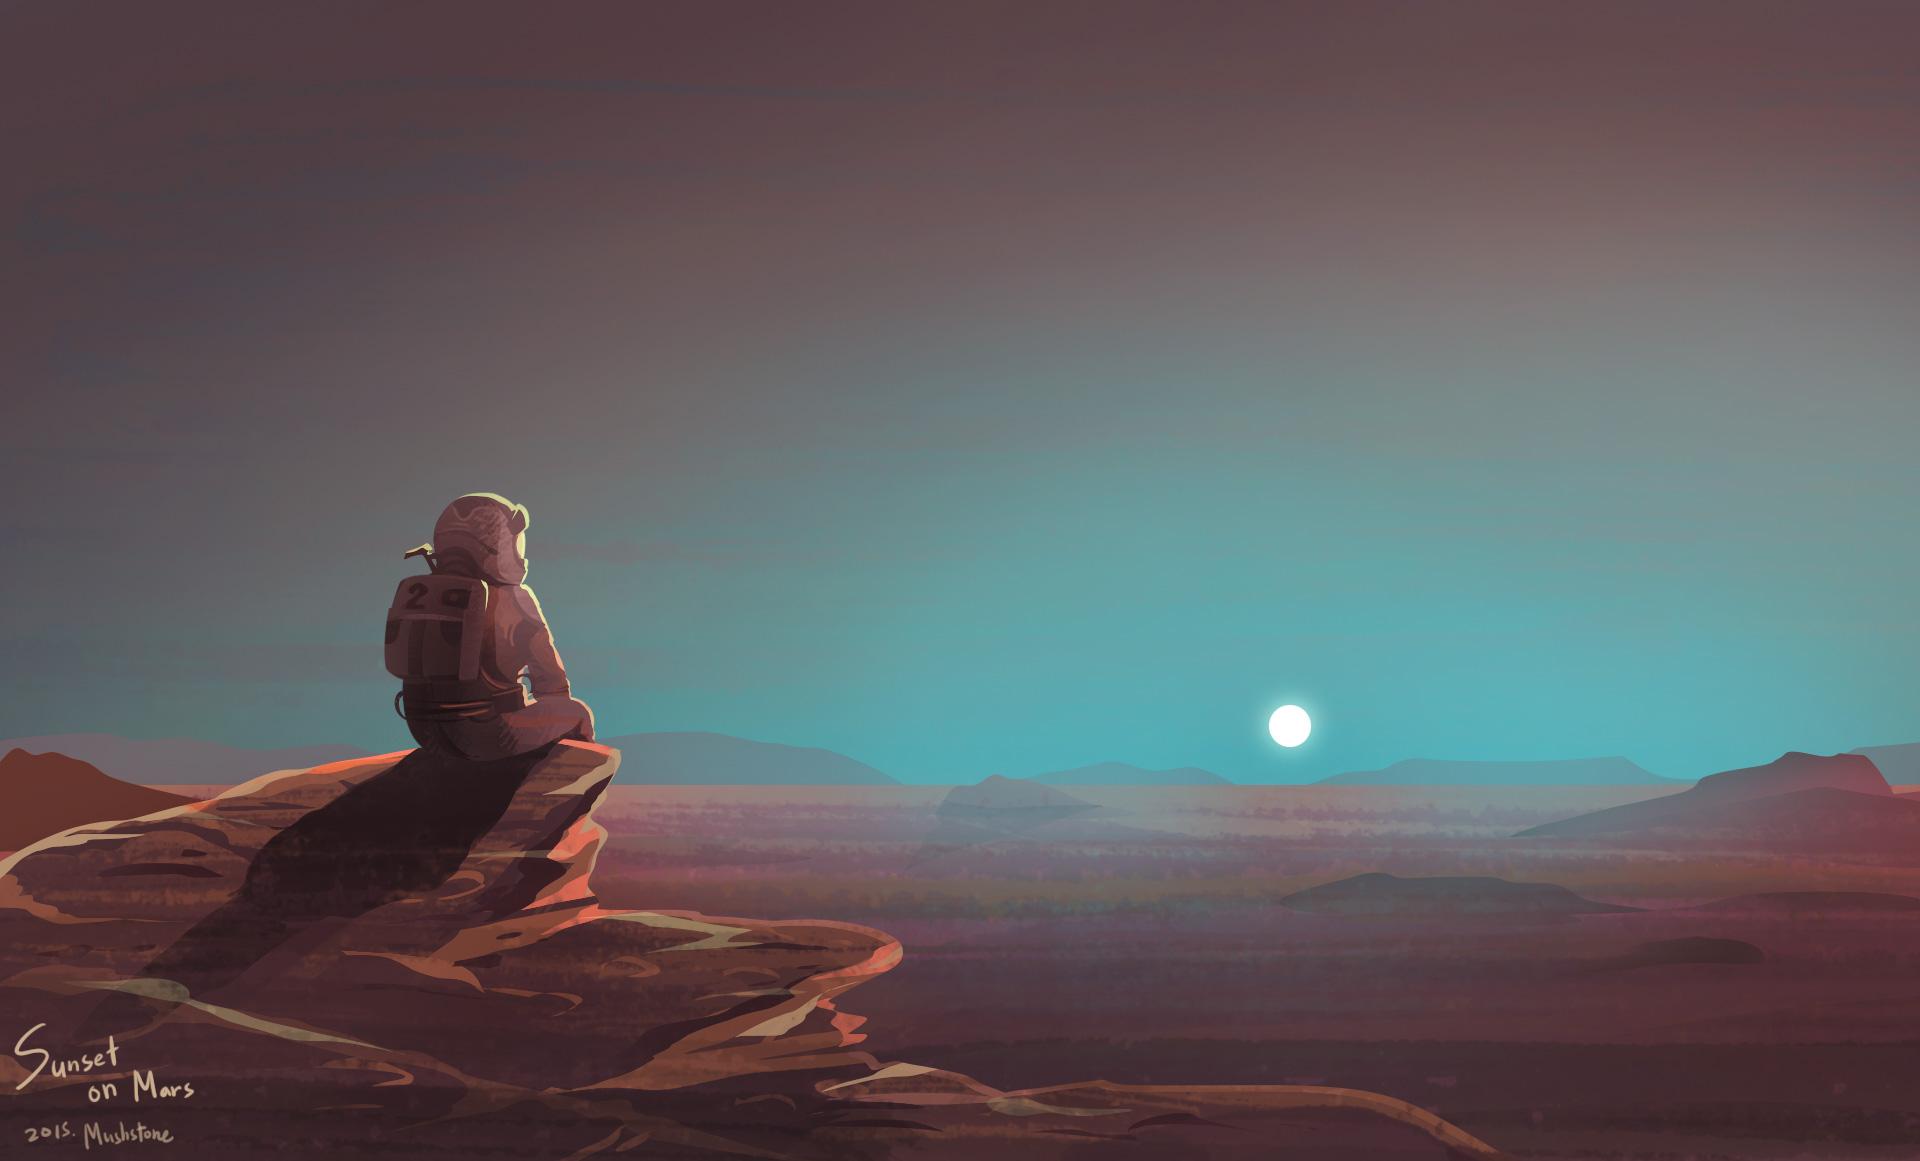 Asuna Android Cute Wallpaper Astronaut Watching Sunset On Mars Hd Artist 4k